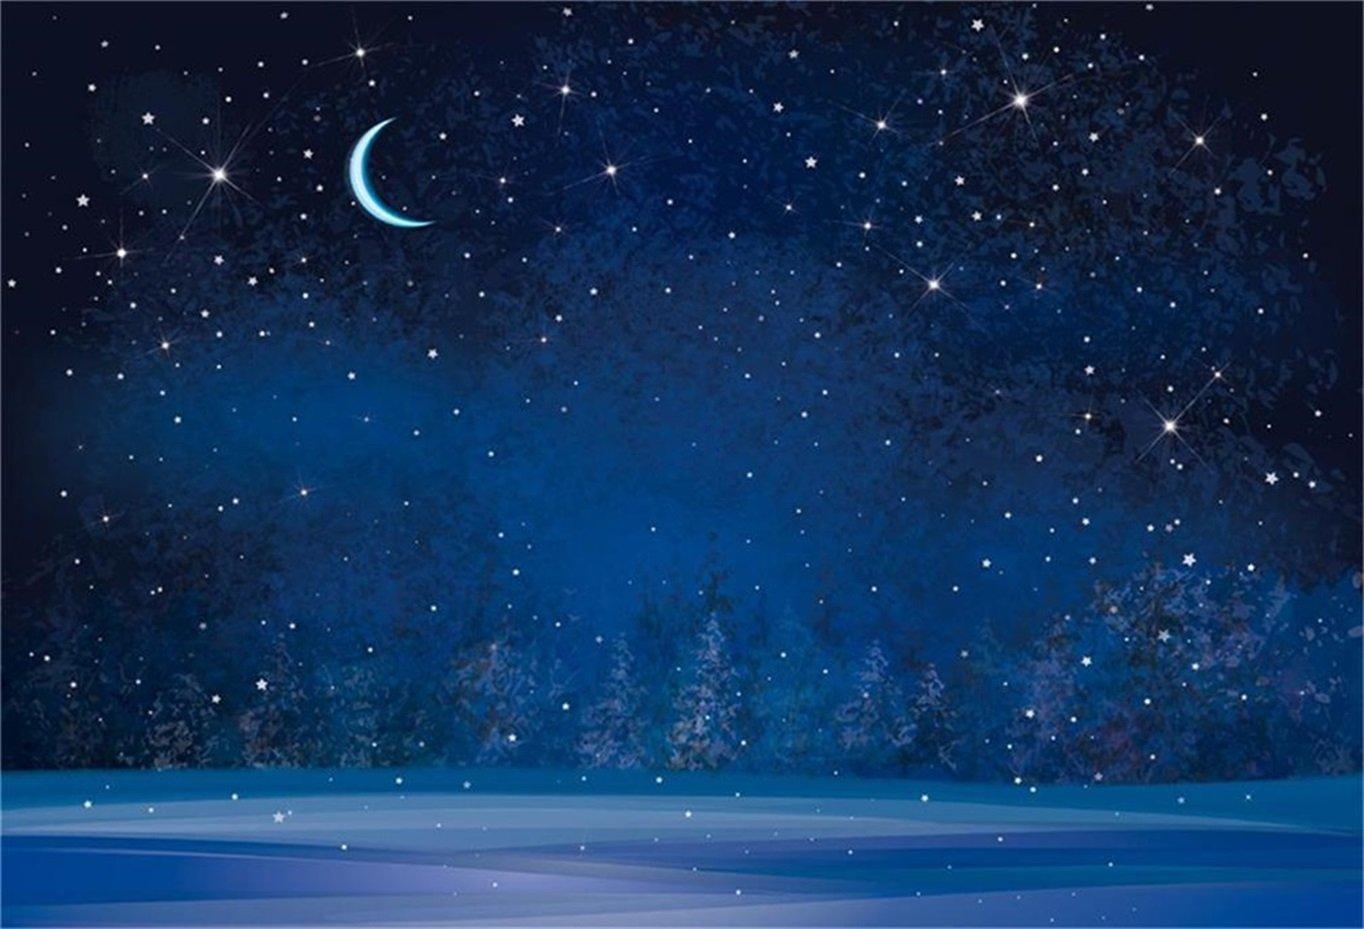 Amazoncom AOFOTO 7x5ft Dreamy Moon Night Fantasy Snowflake 1364x929